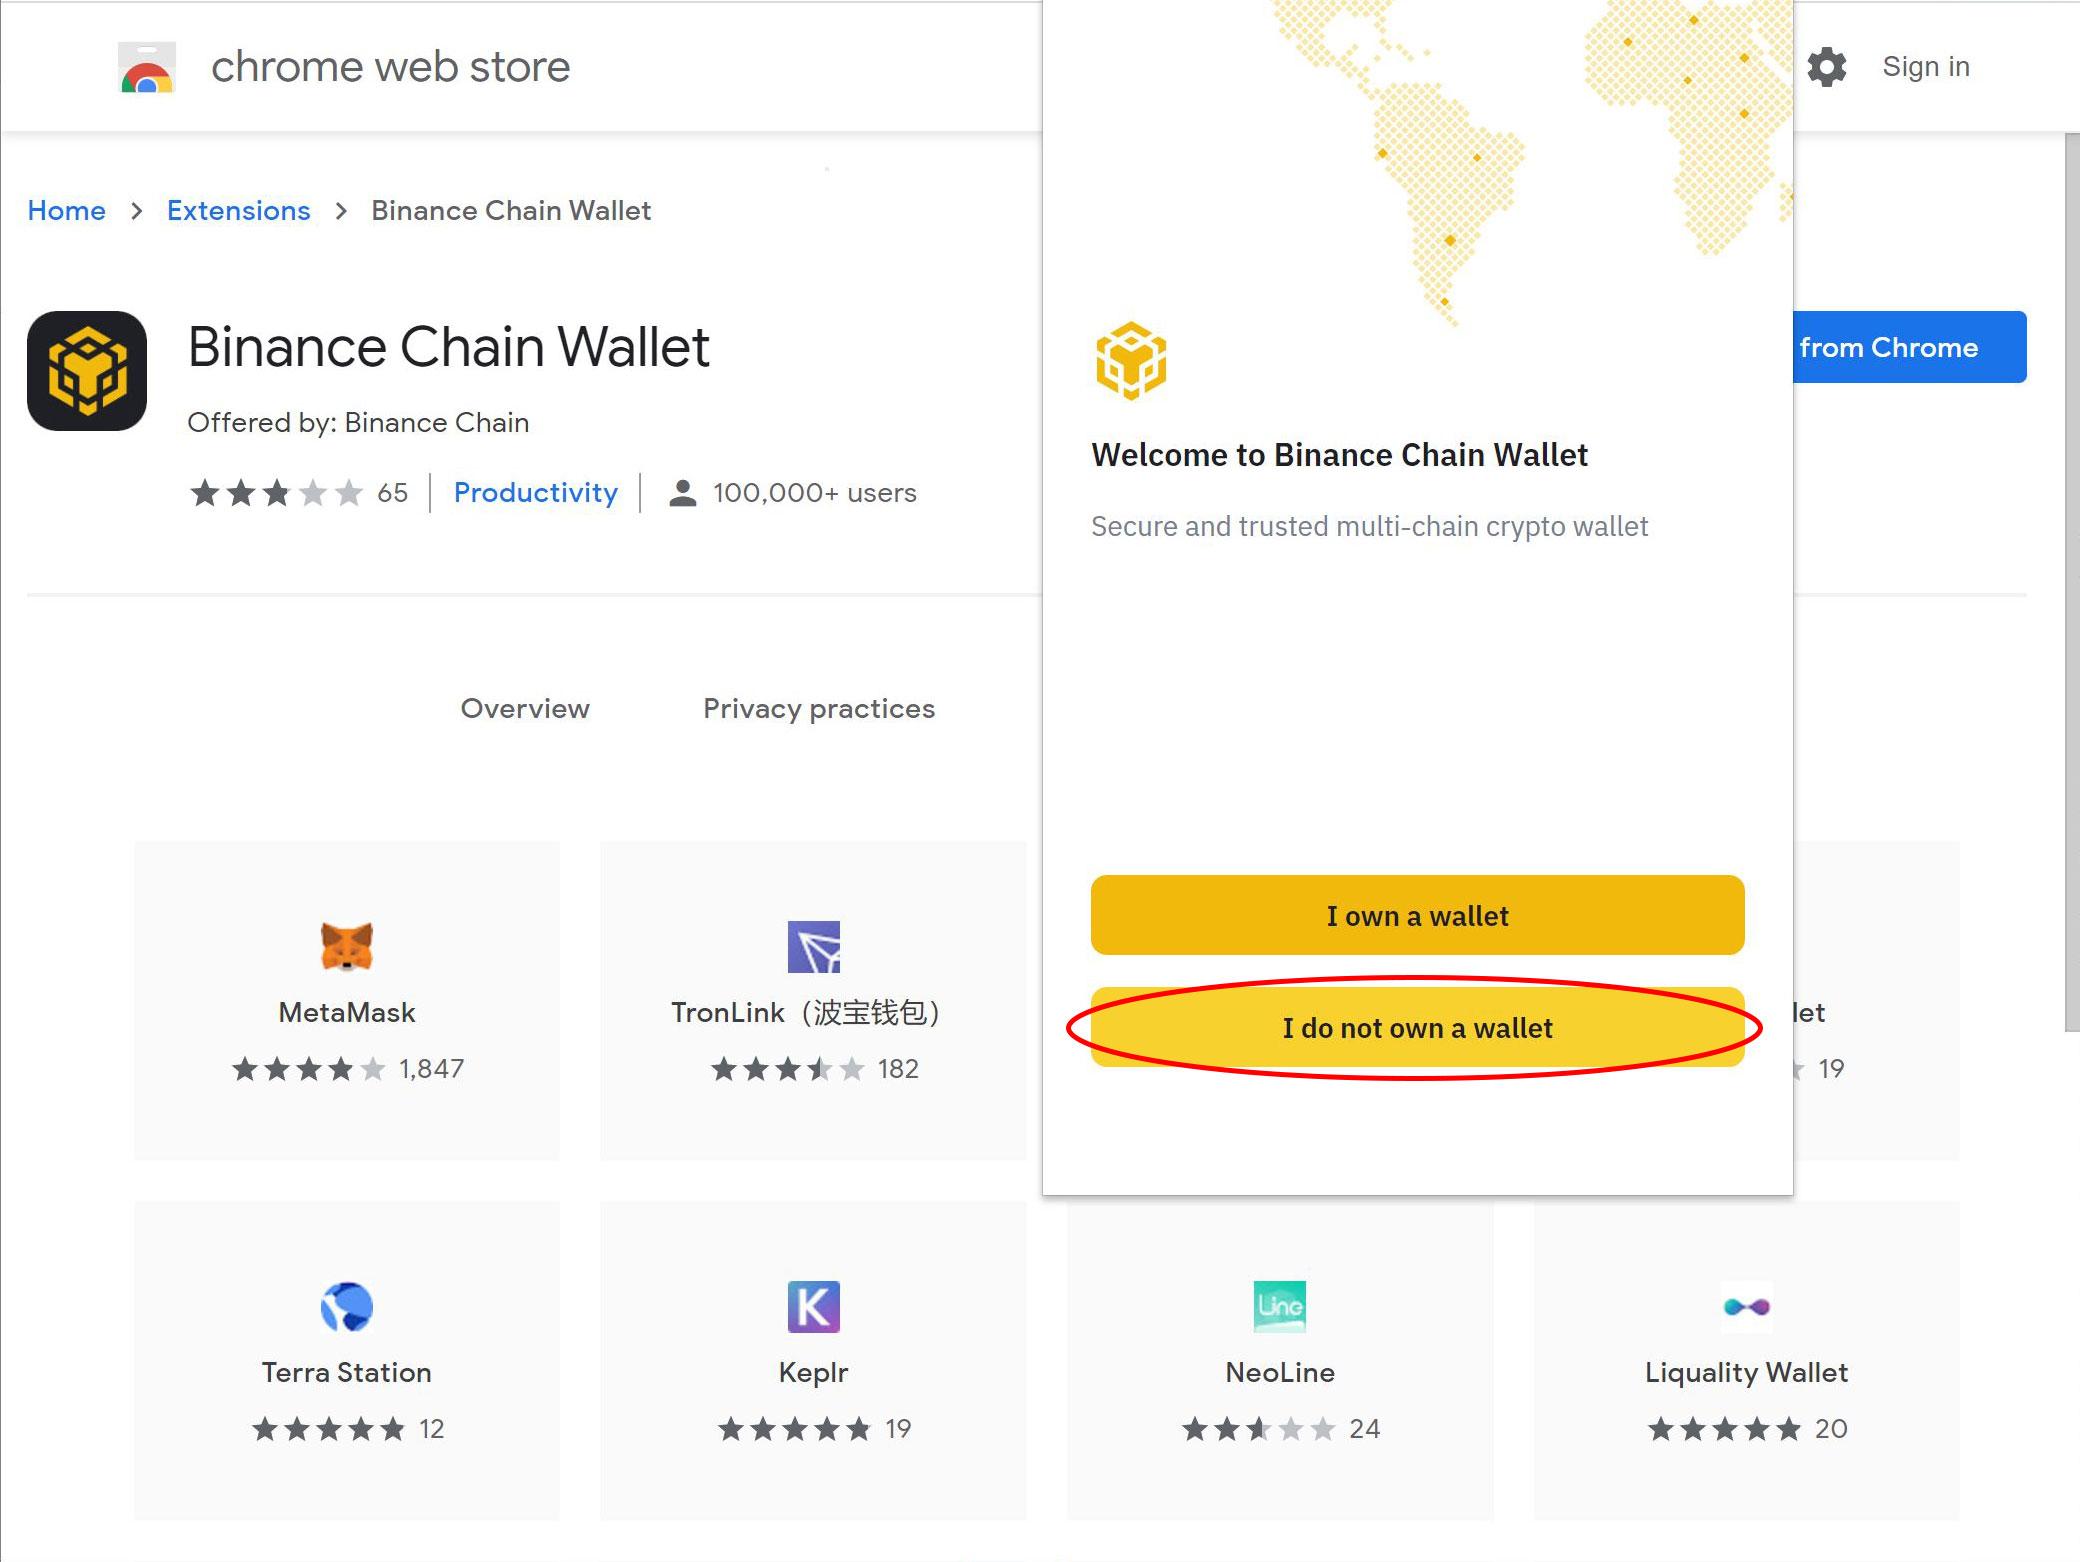 Binance chain wallet I do not own a wallet